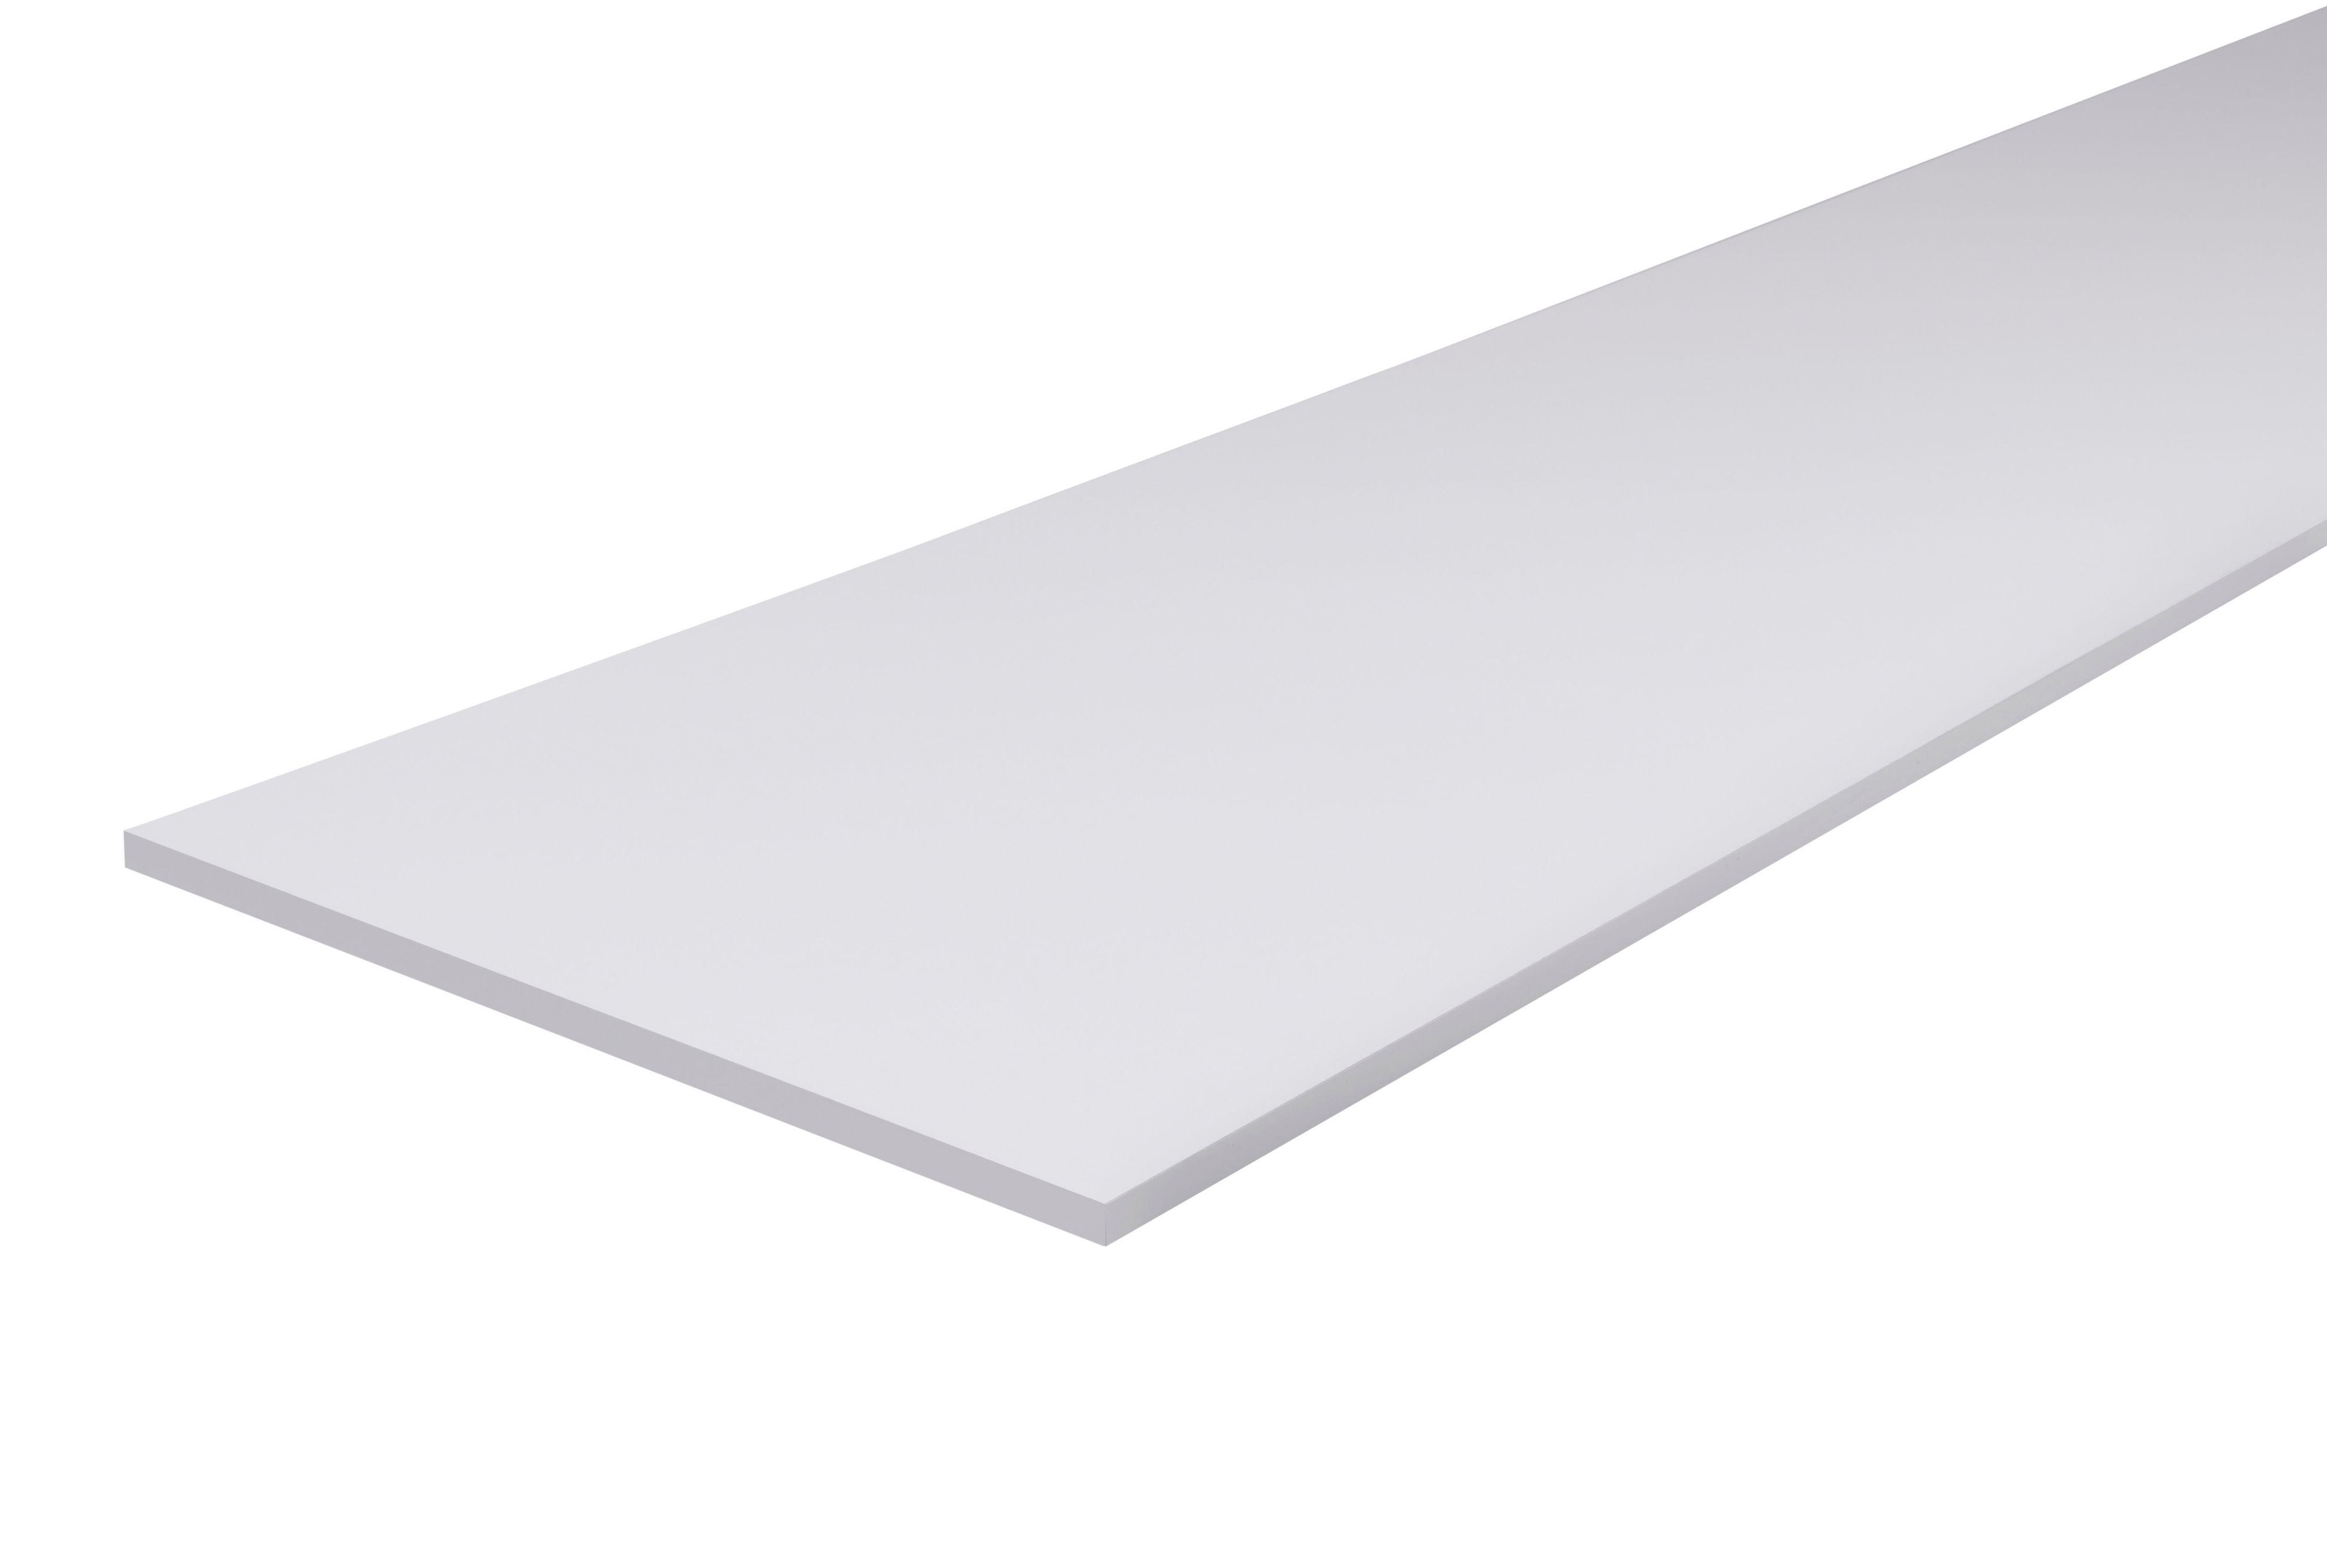 Furniture panel White (L)1200mm (W)200mm (T)18mm